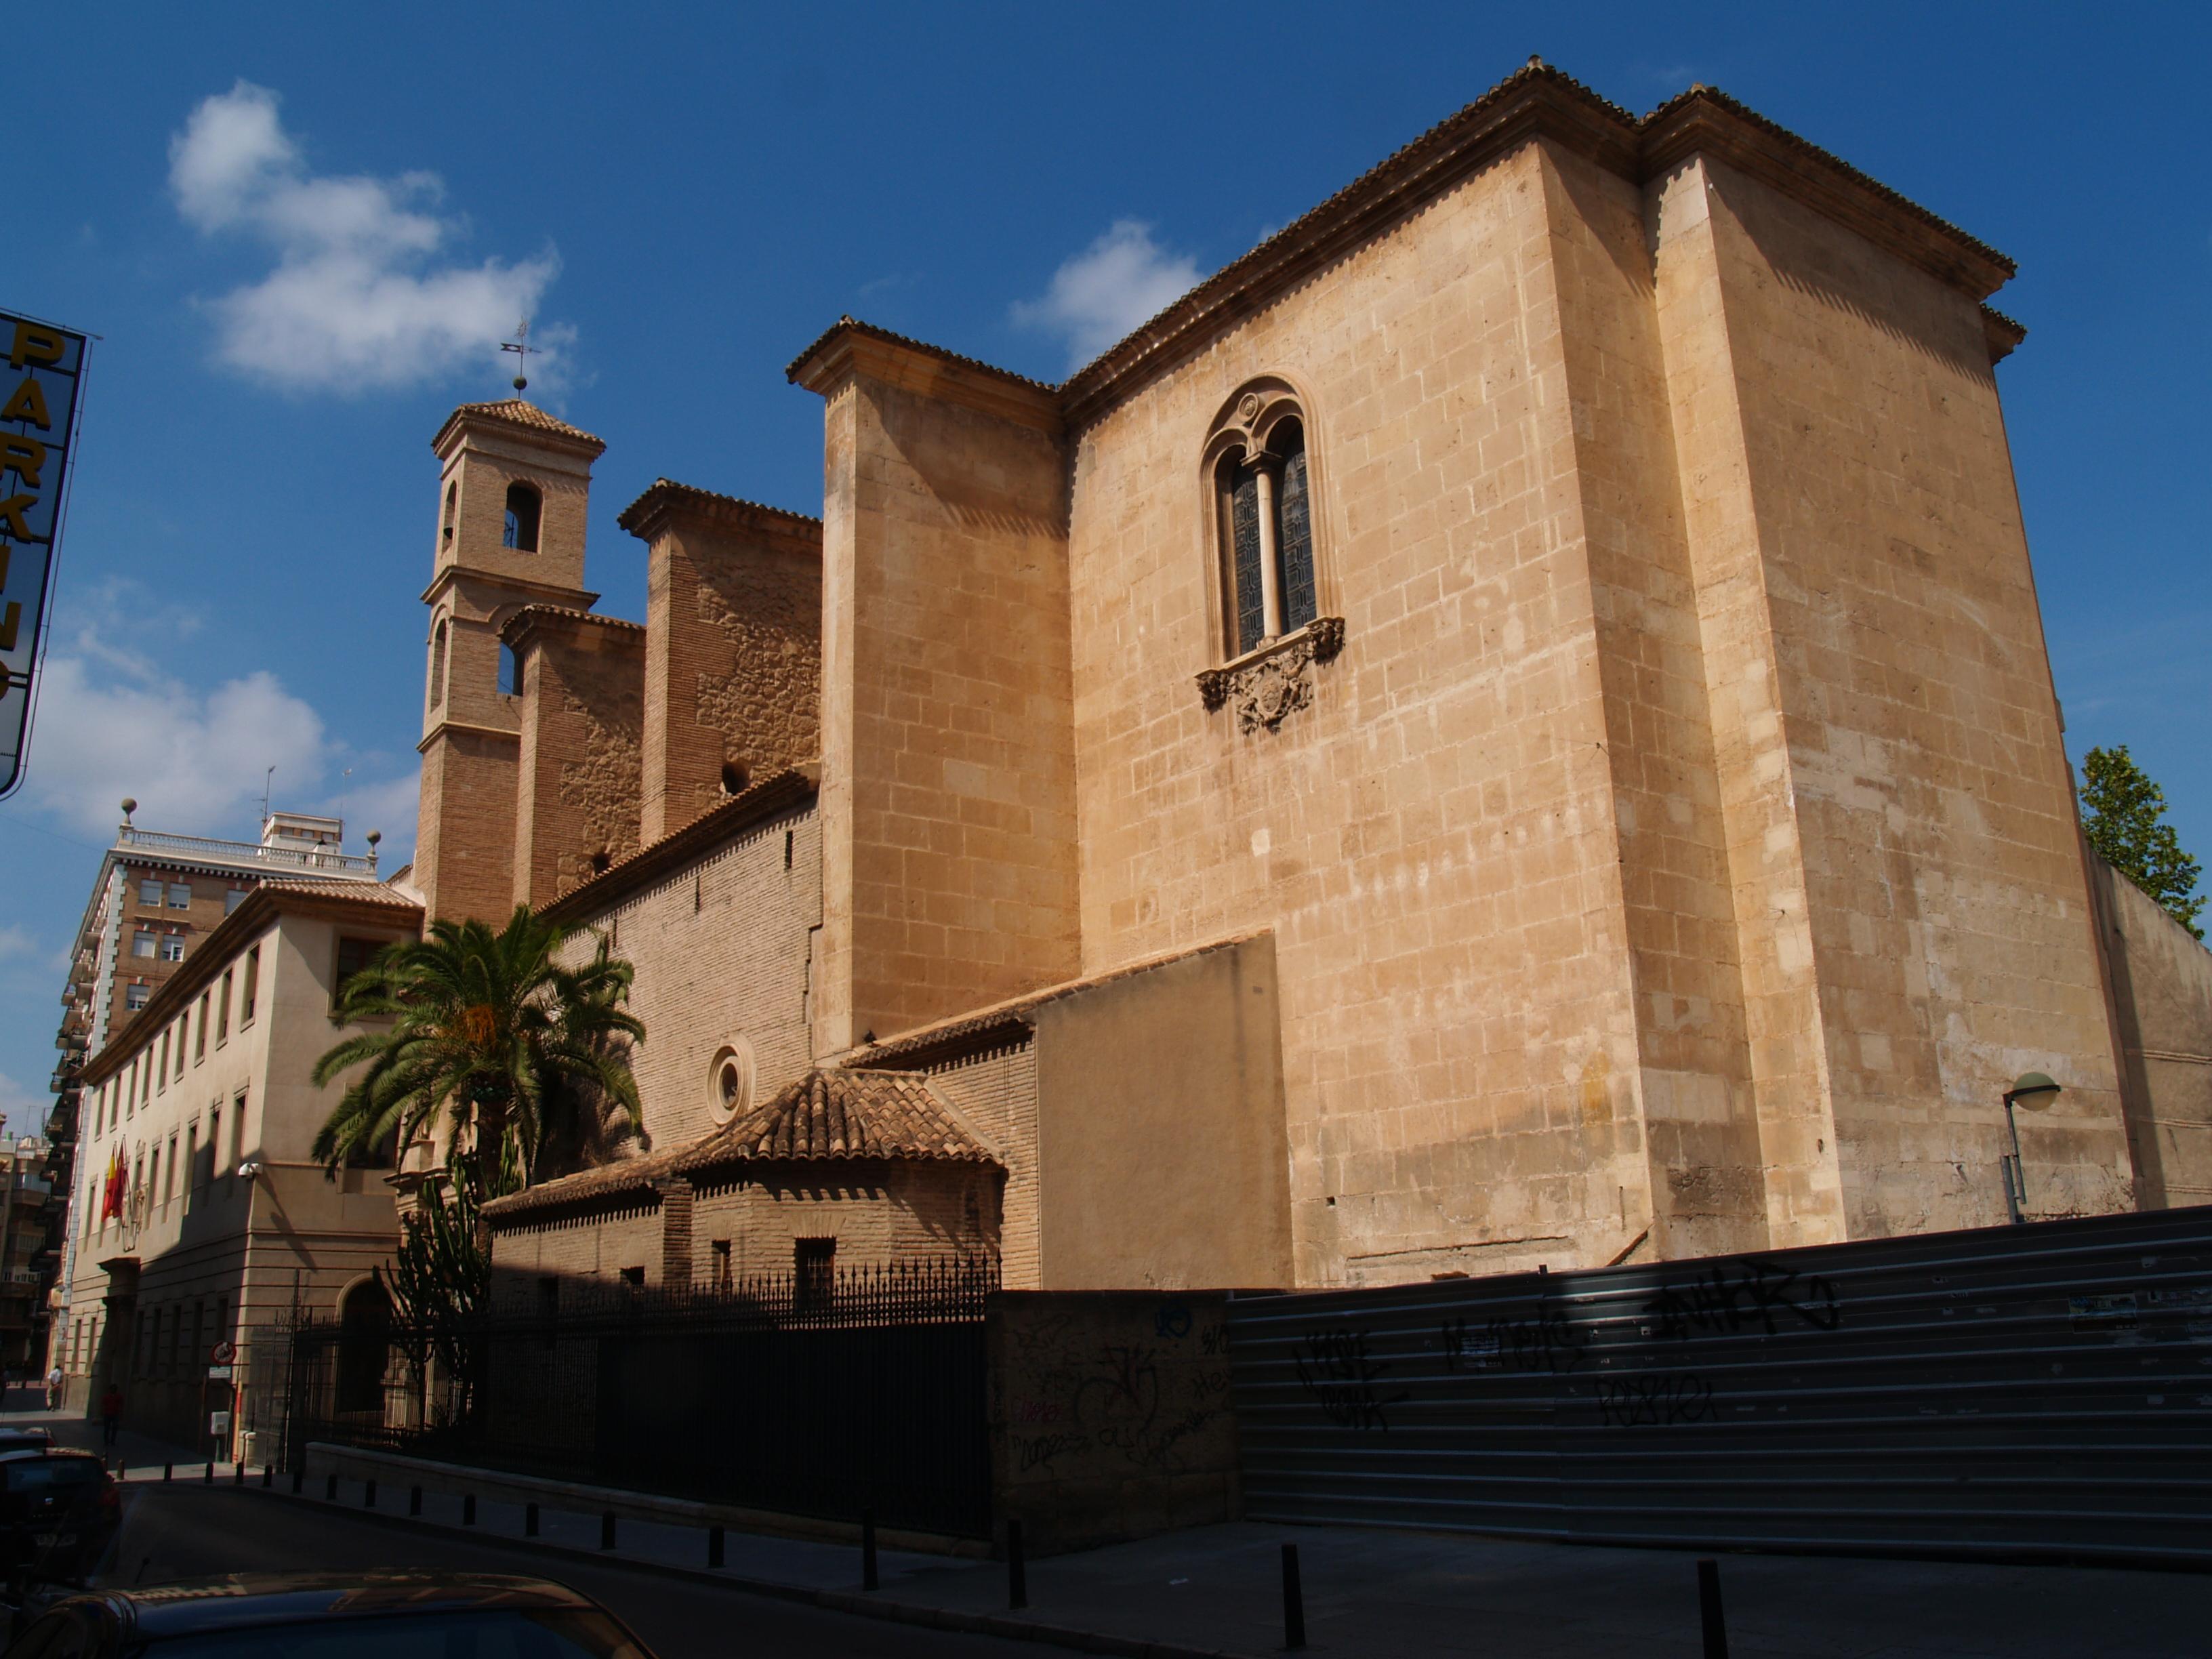 File:Iglesia de San Esteban (Murcia).jpg - Wikimedia Commons